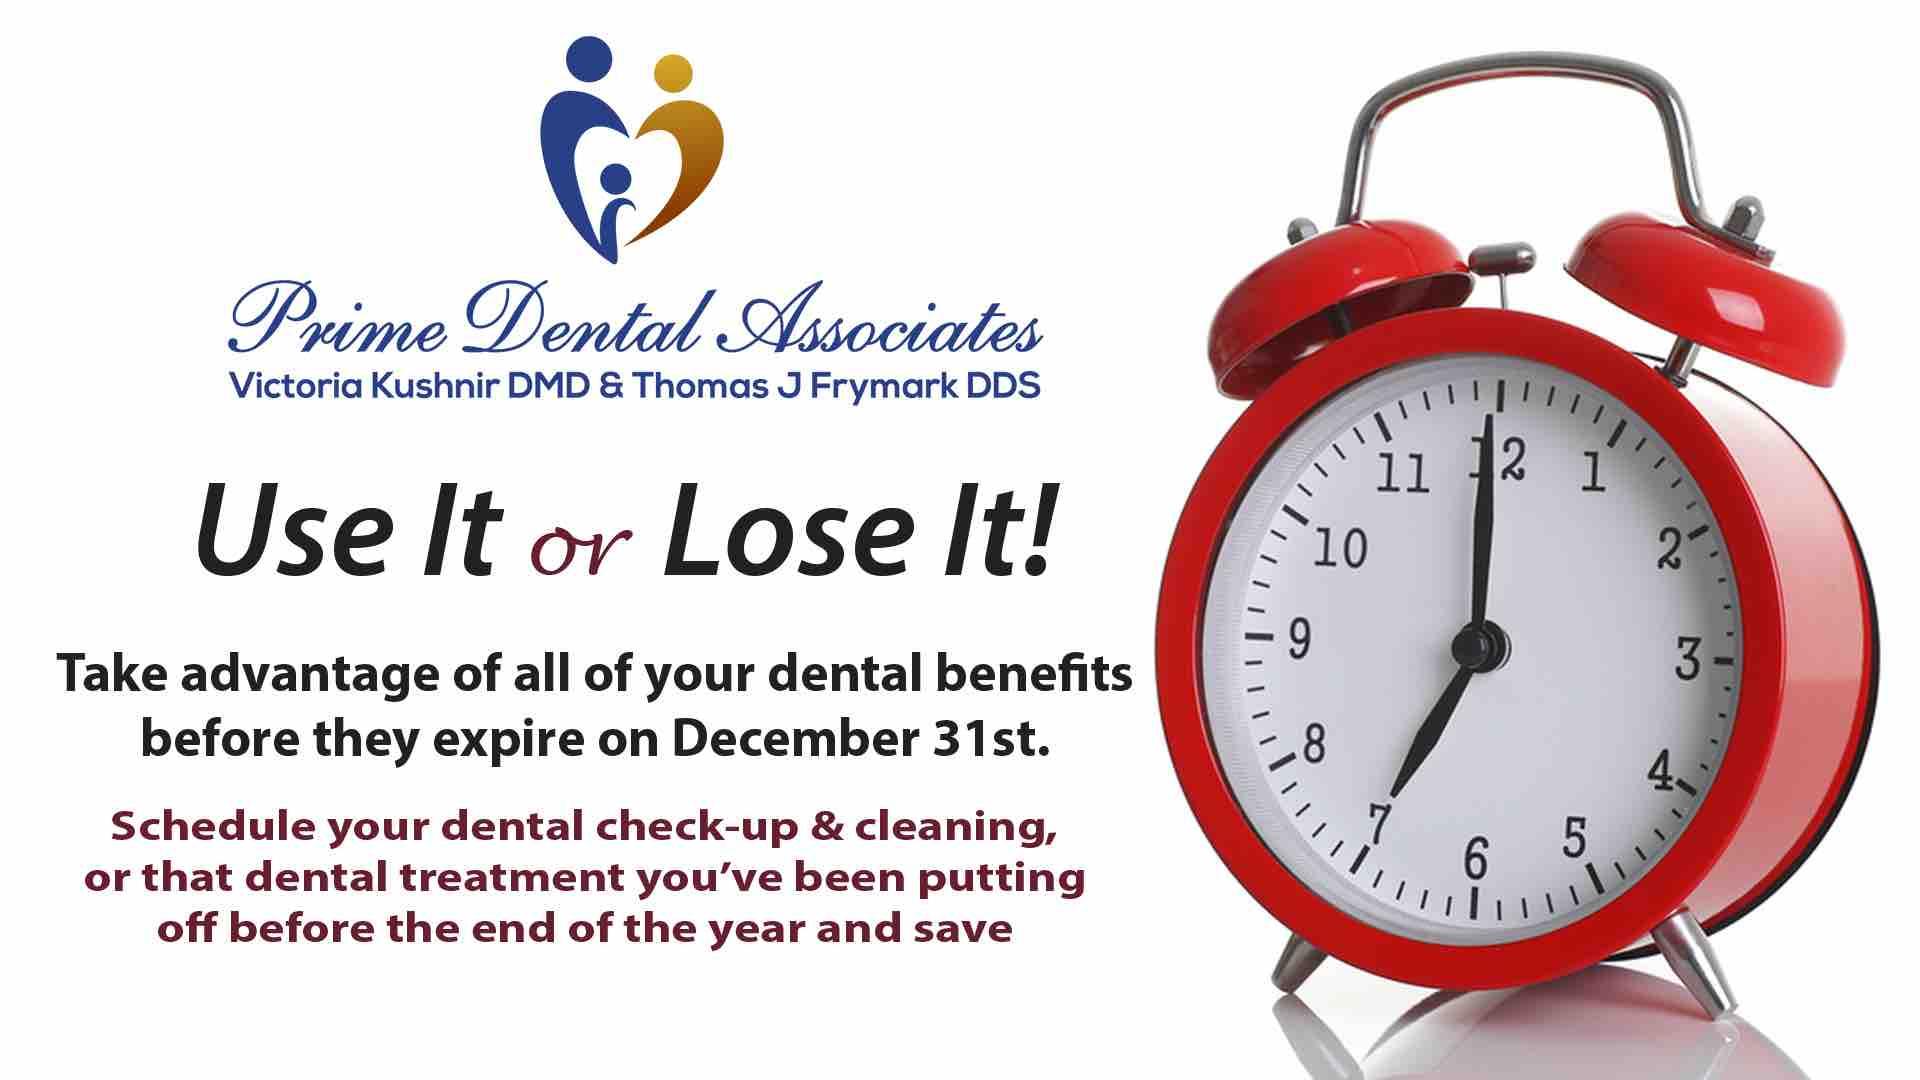 Prime Dental Associates | Johnsburg IL | On the traffic circle